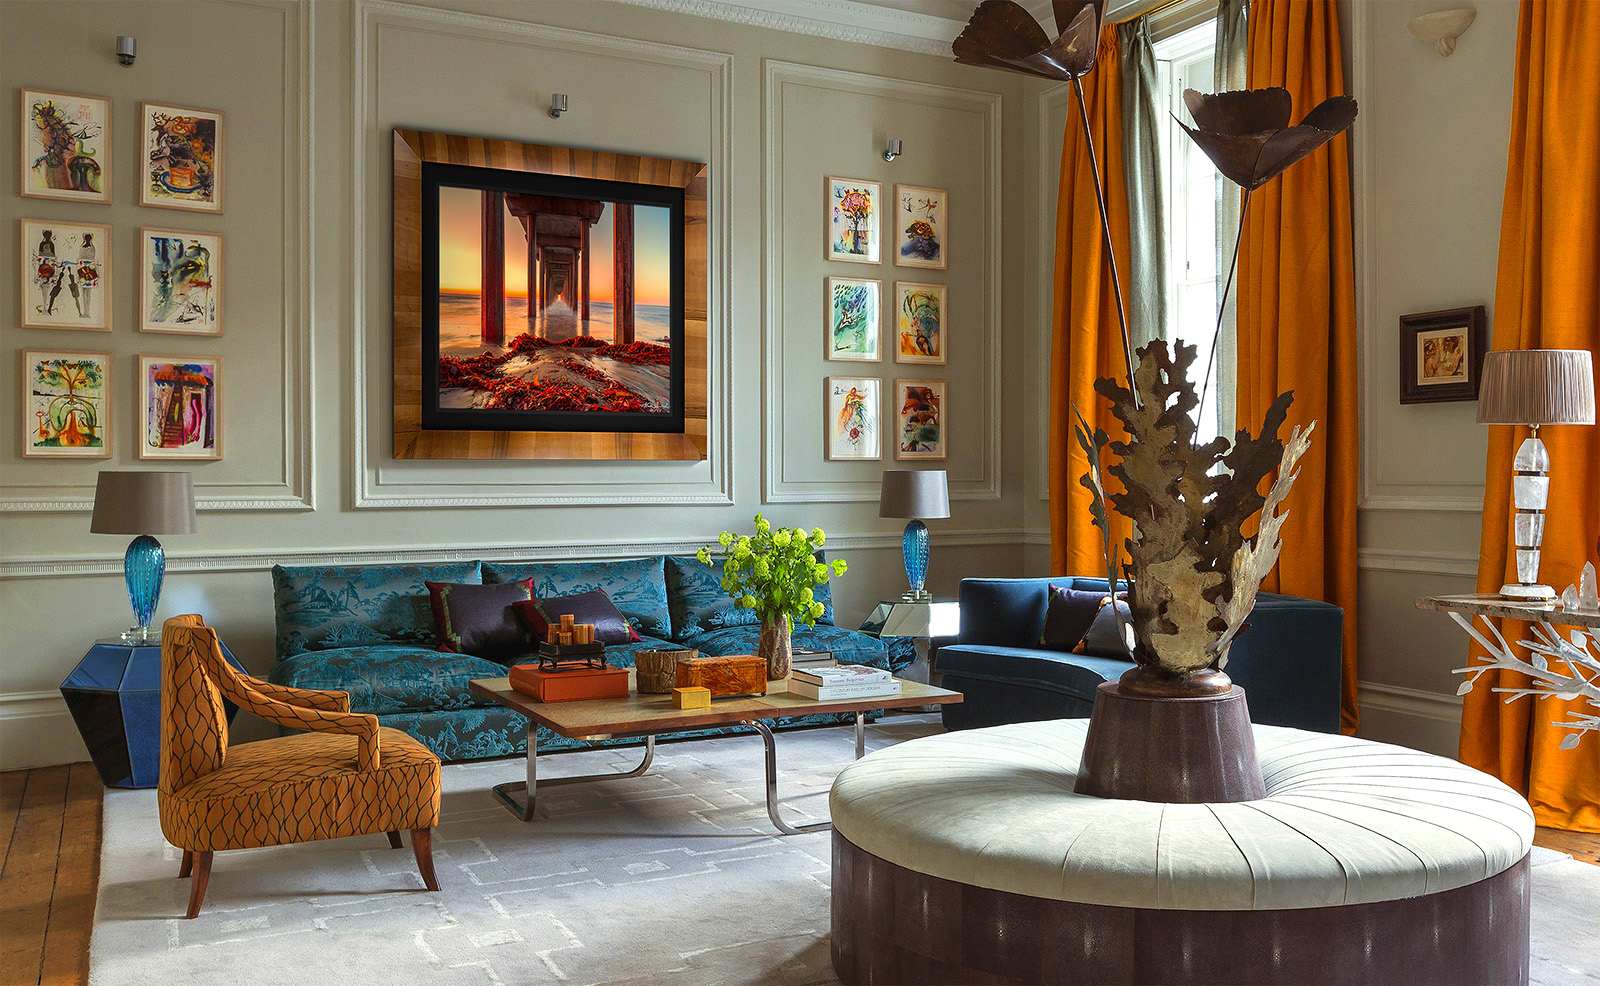 Alexander Vershinin, Luxury, Fine Art, Framed Art